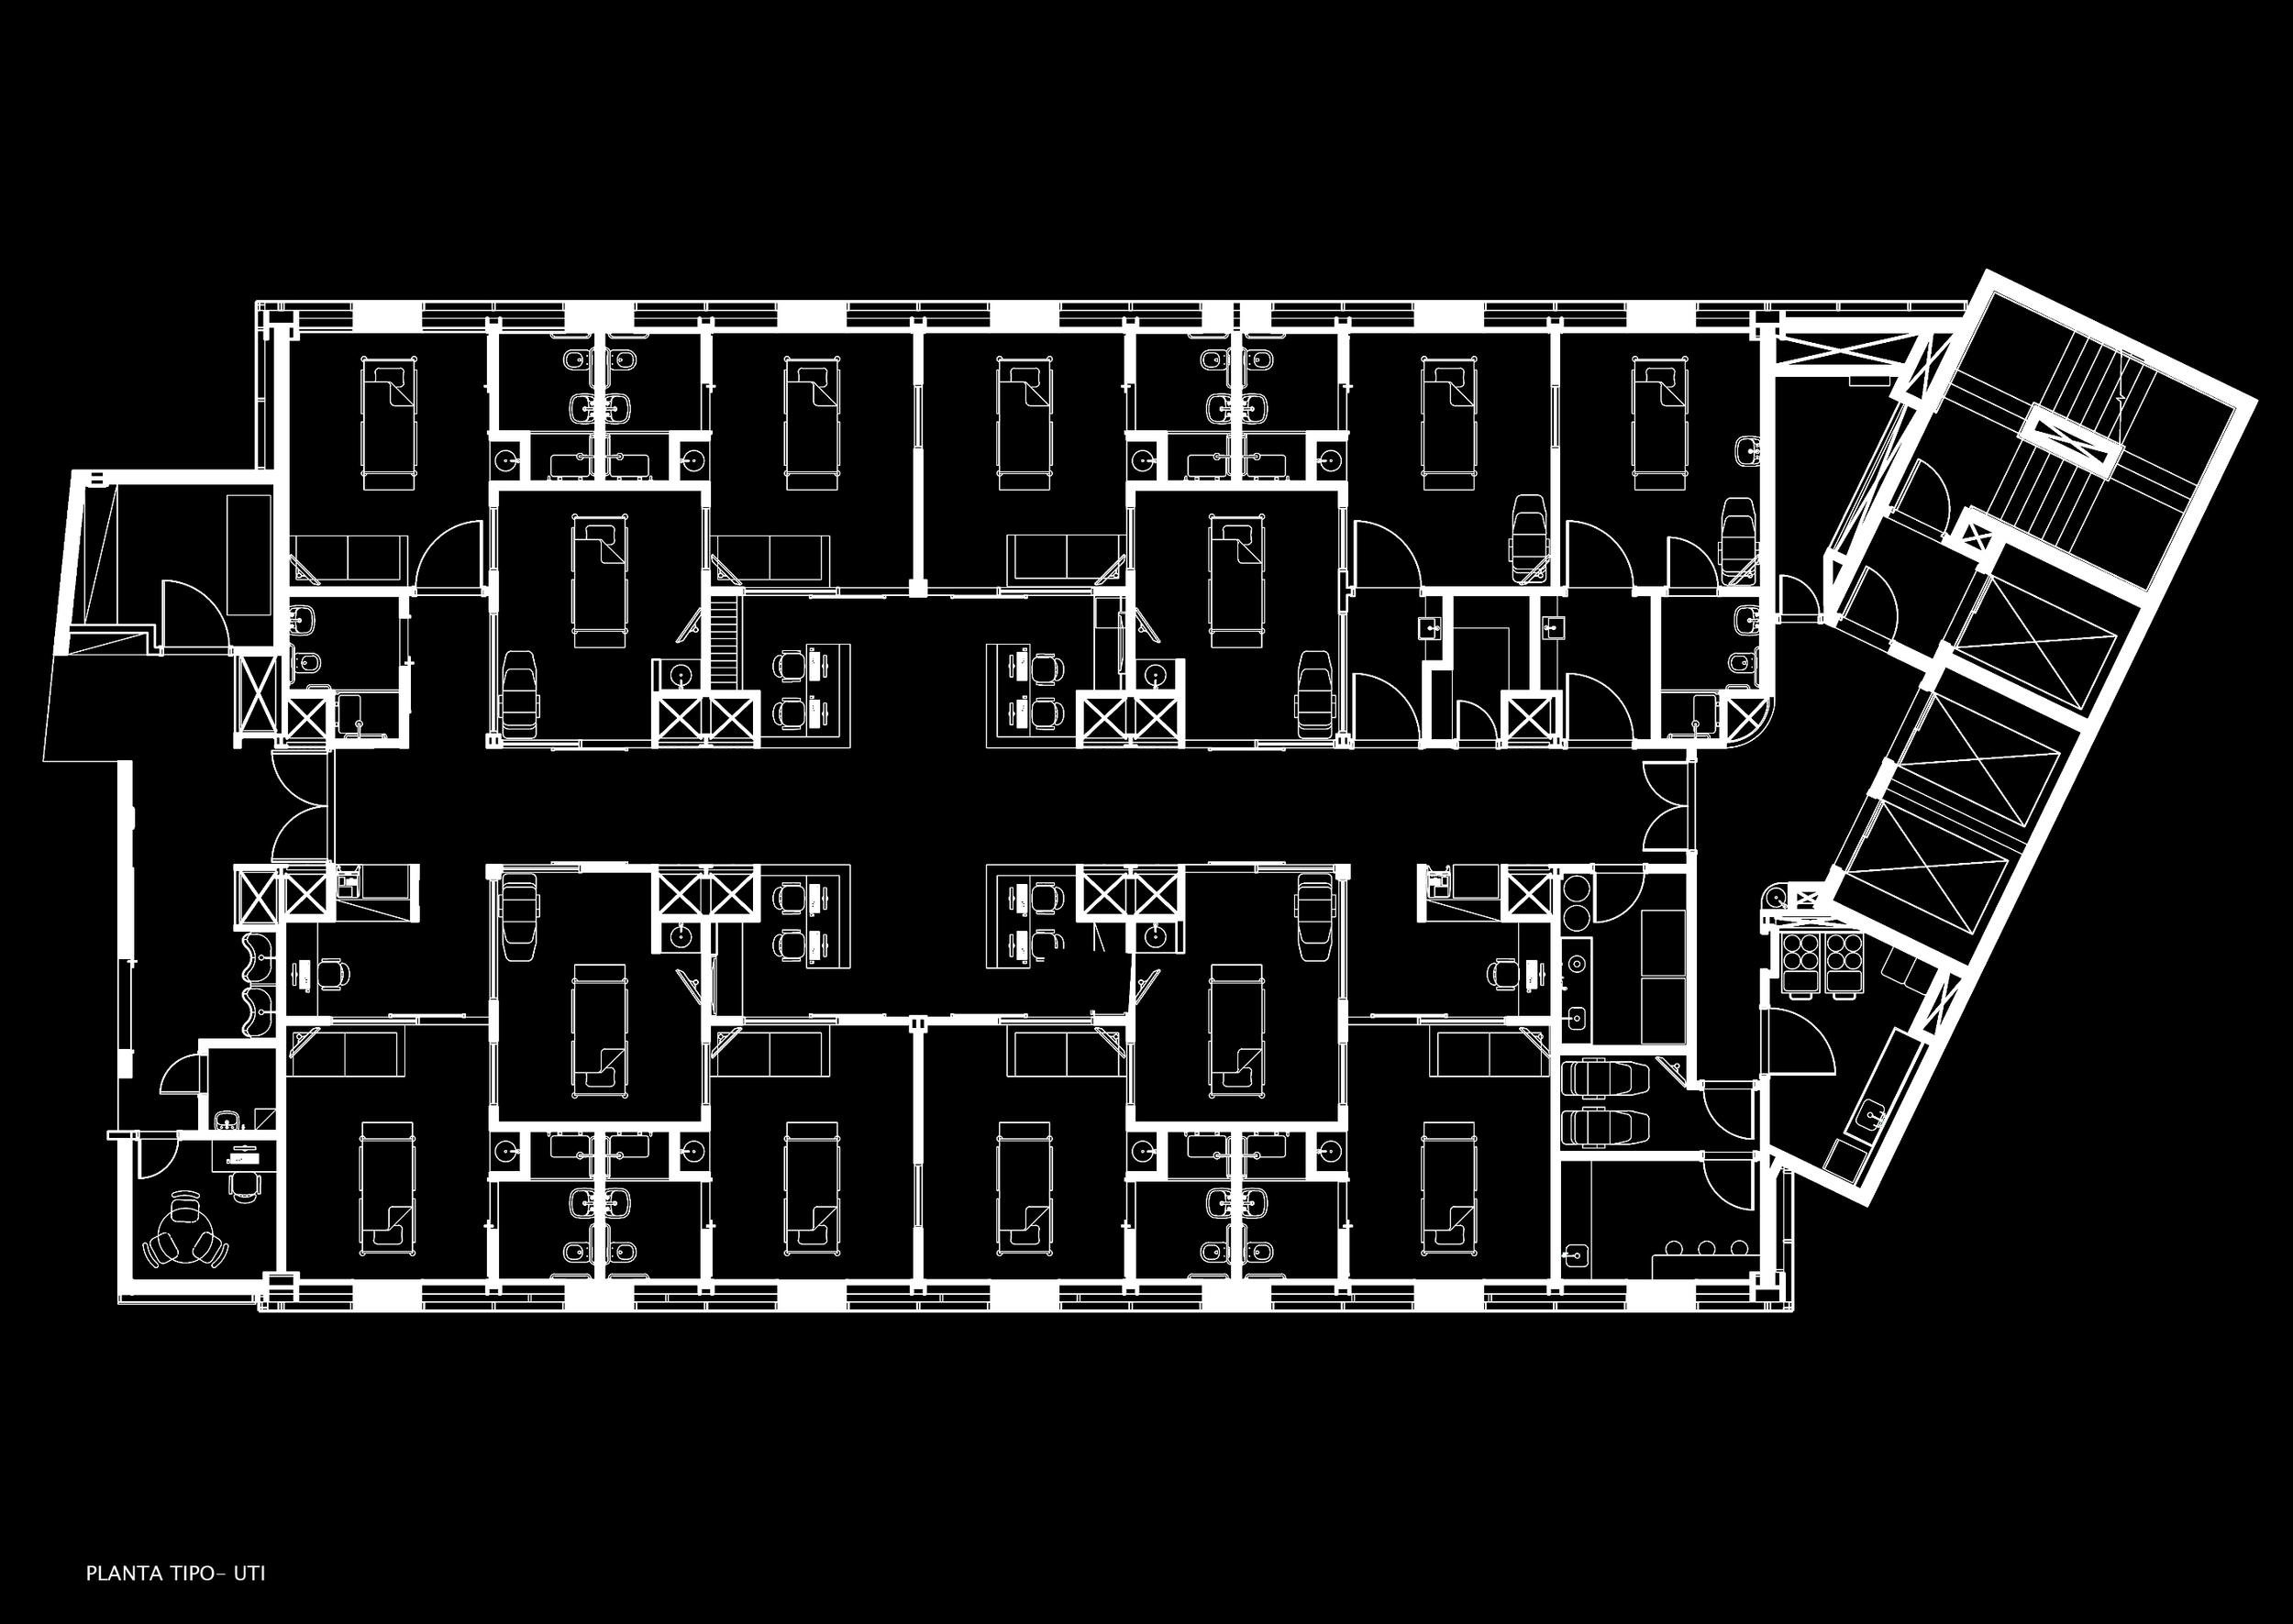 3 H9J-AMPL_PLANTA TIPO UTI.jpg